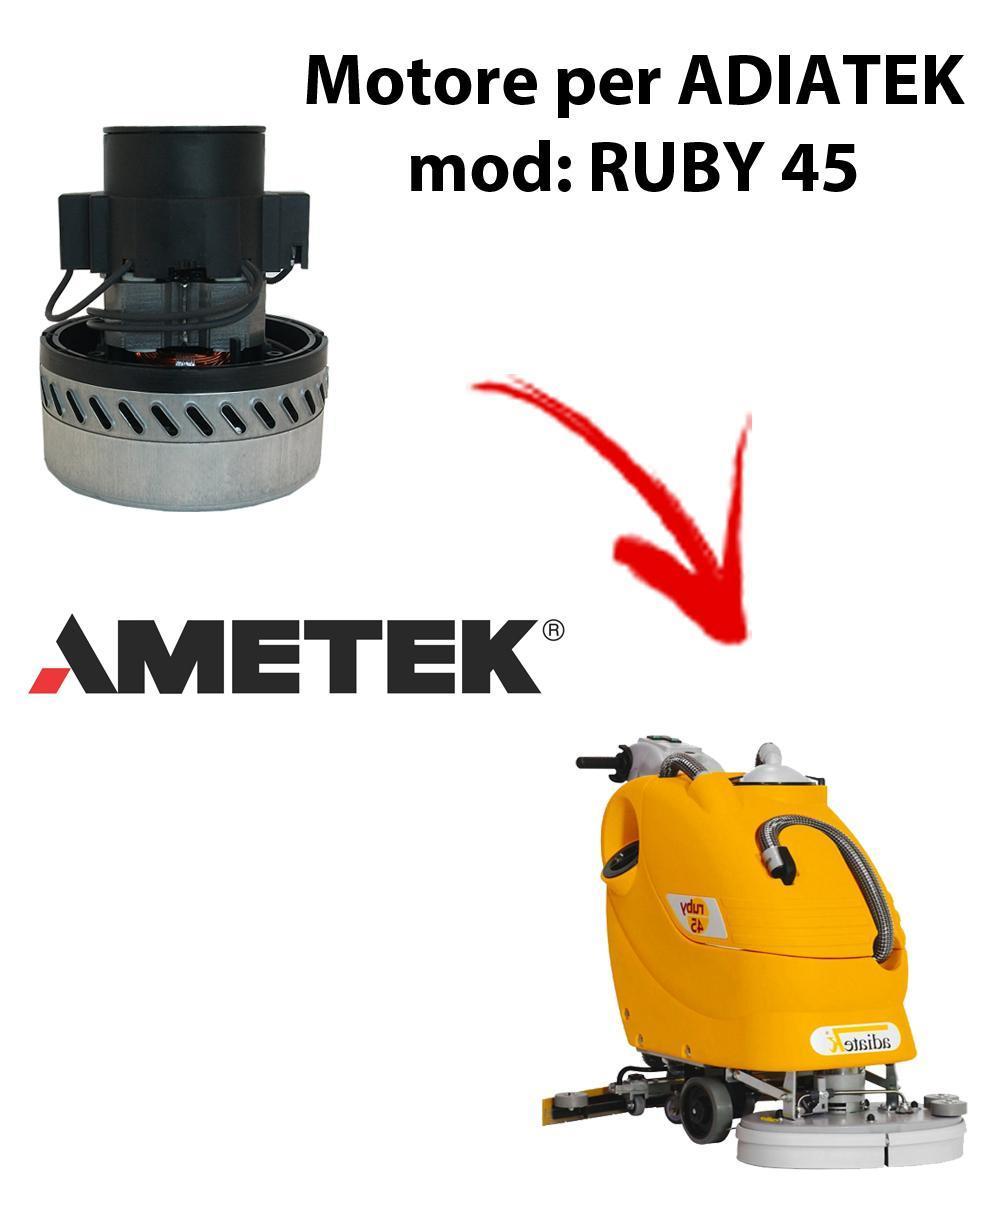 RUBY 45 Motore de aspiración Ametek Italia  para fregadora Adiatek